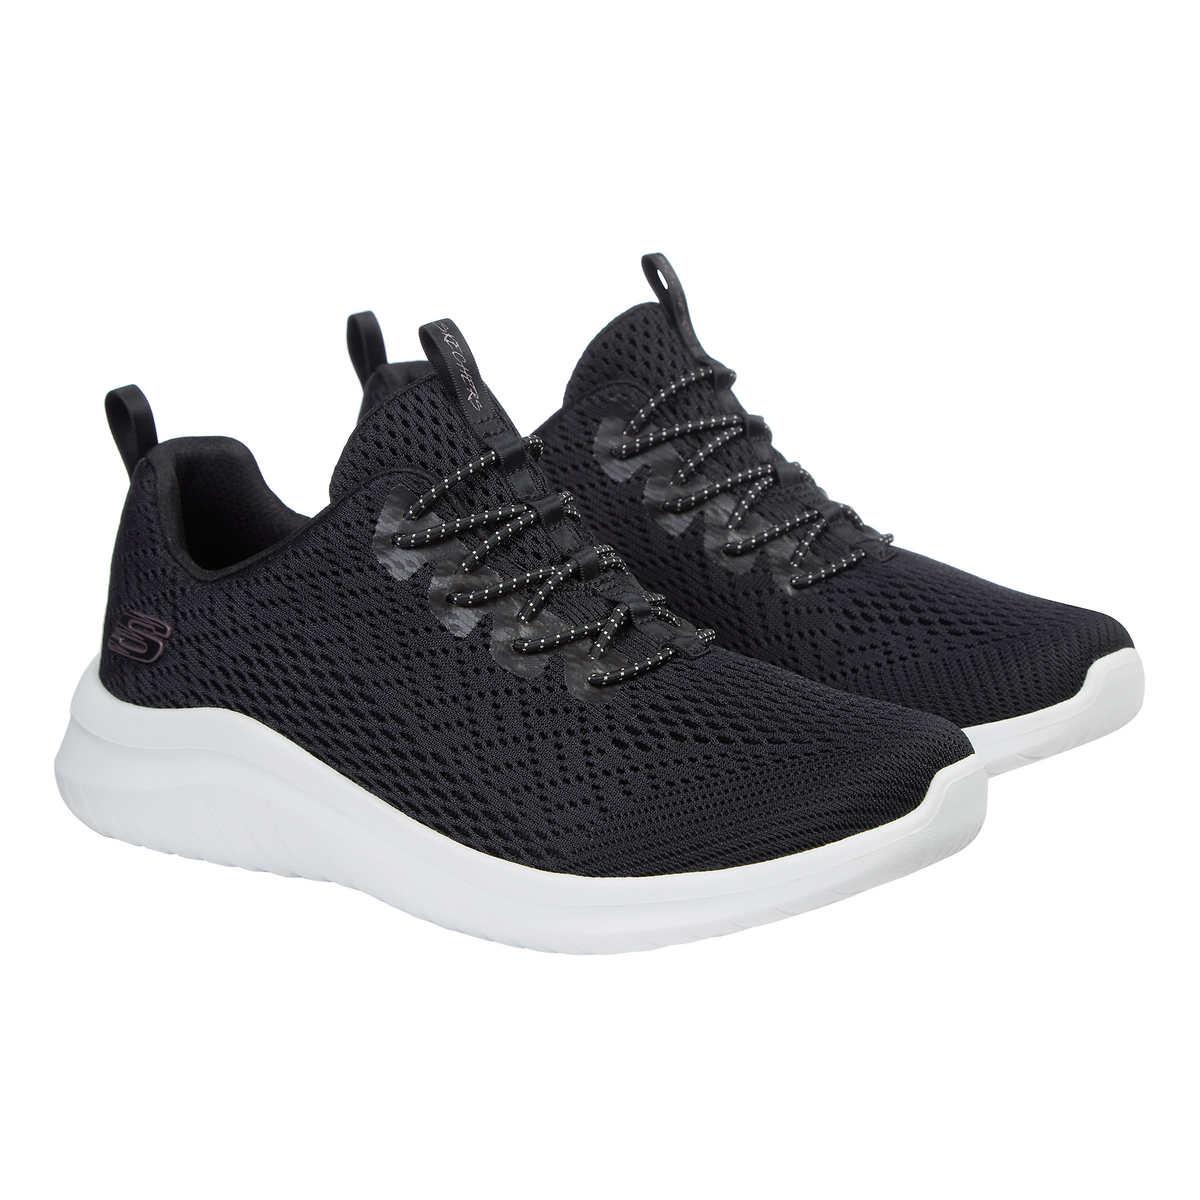 capitalismo Inseguro Colonial  Skechers Ladies Ultraflex Bungee Slip on Memory Foam Shoes Black 12550 8  for sale online   eBay